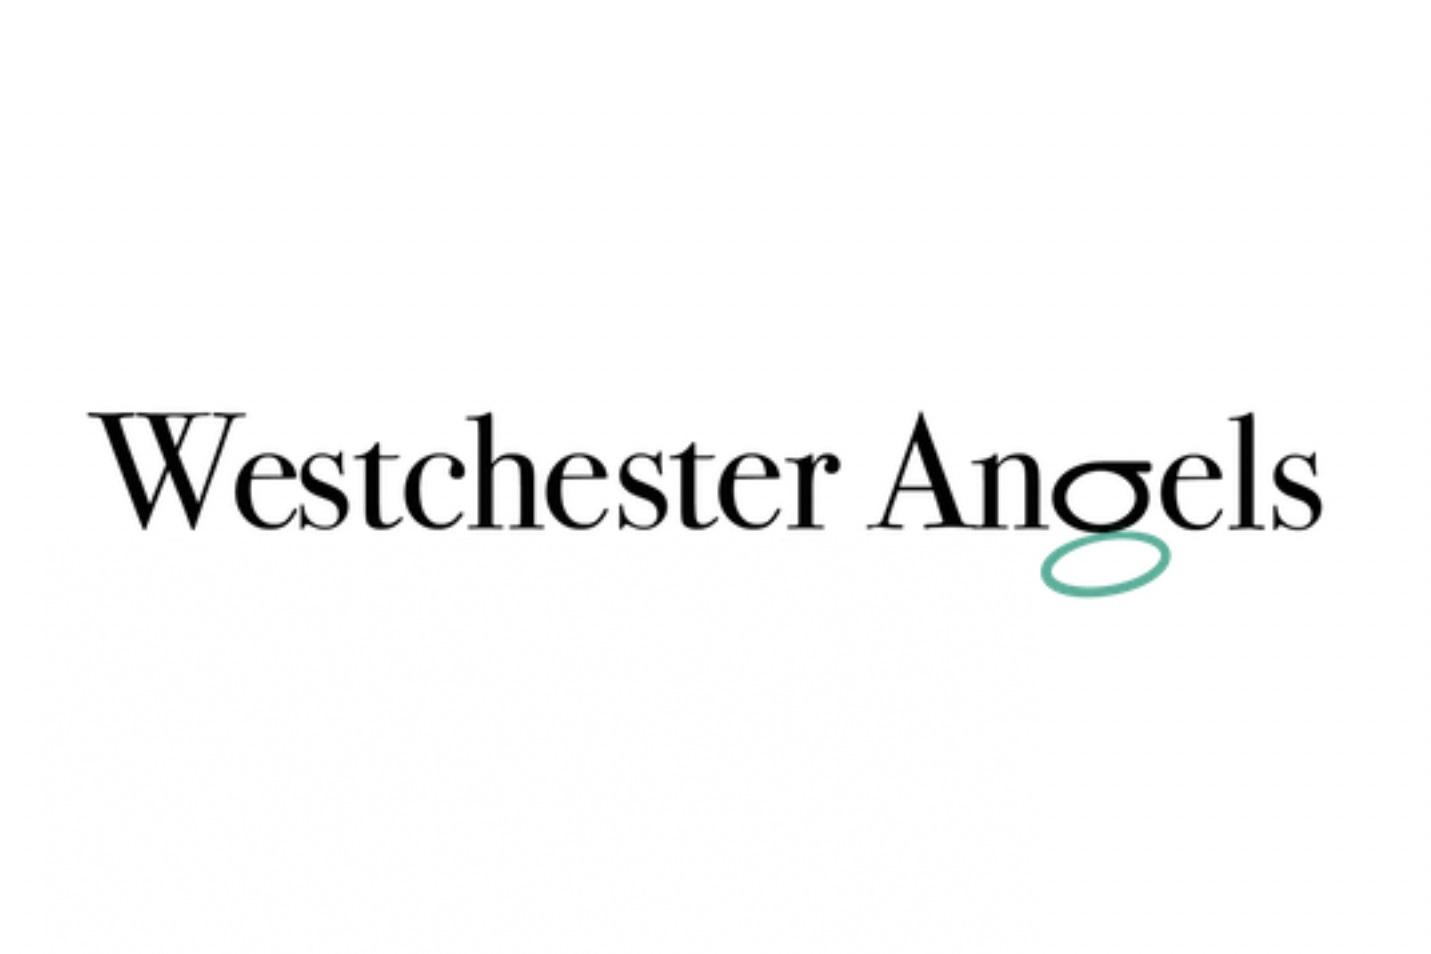 Westchester Angels